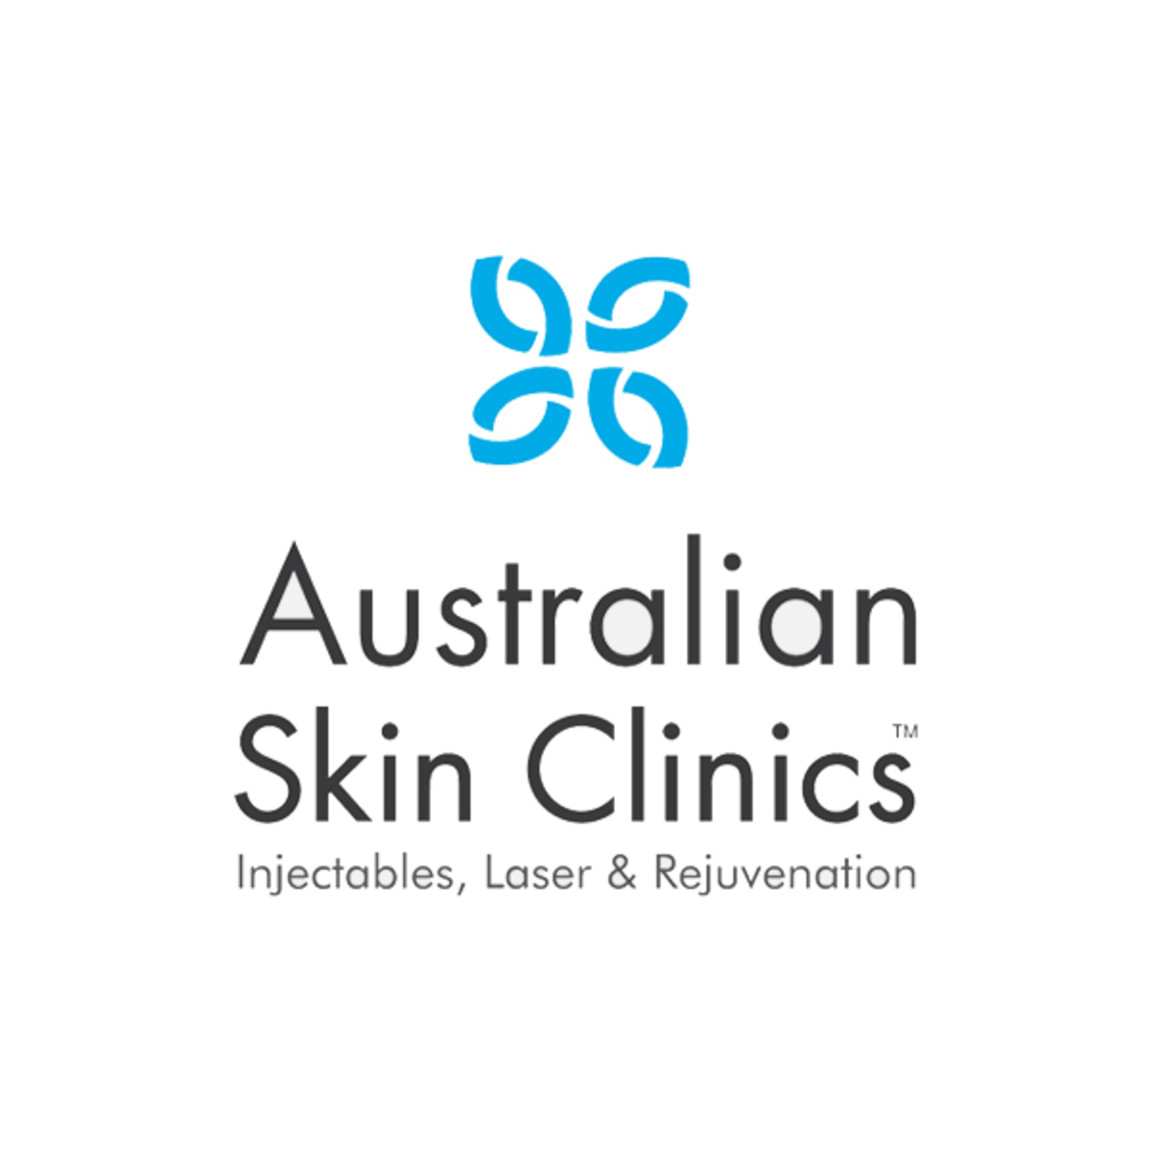 Australian Skin Clinics at Westfield Hornsby